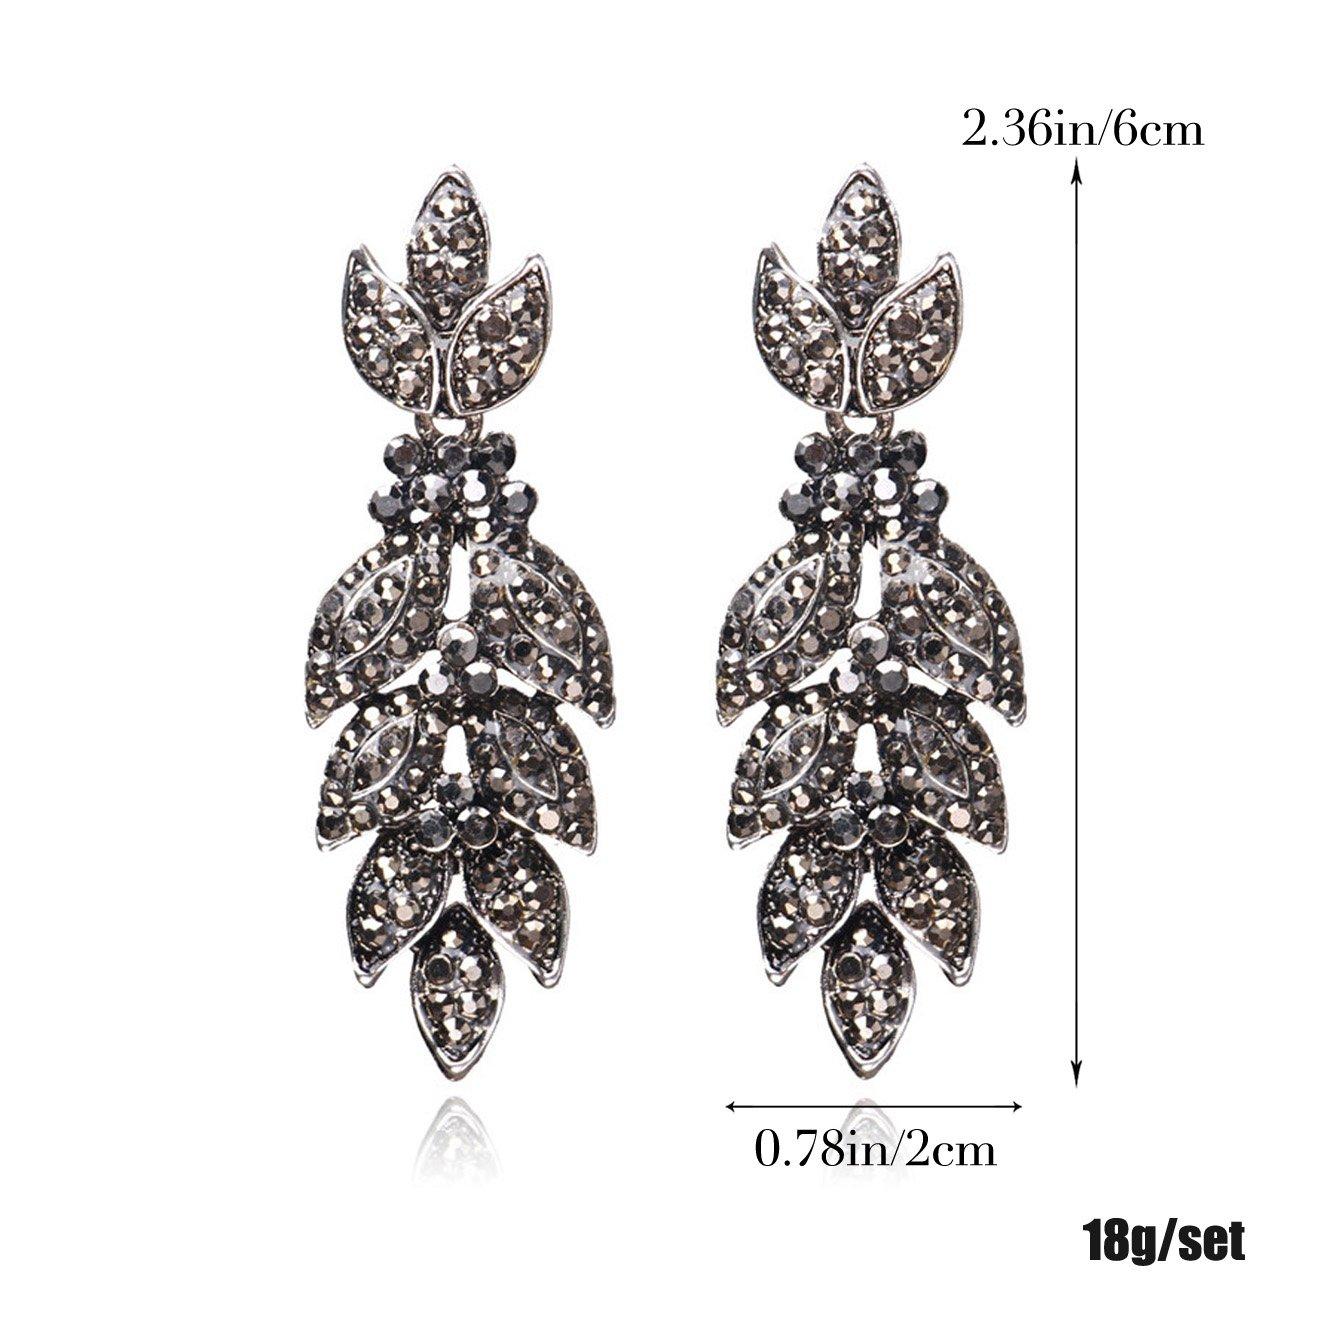 Unicra Vintage Black Crystal Stud Earrings Wedding Bridal Multiple Rhinestone Earrings Chandelier Long Dangle Earrings for Women and Girls by Unicra (Image #3)